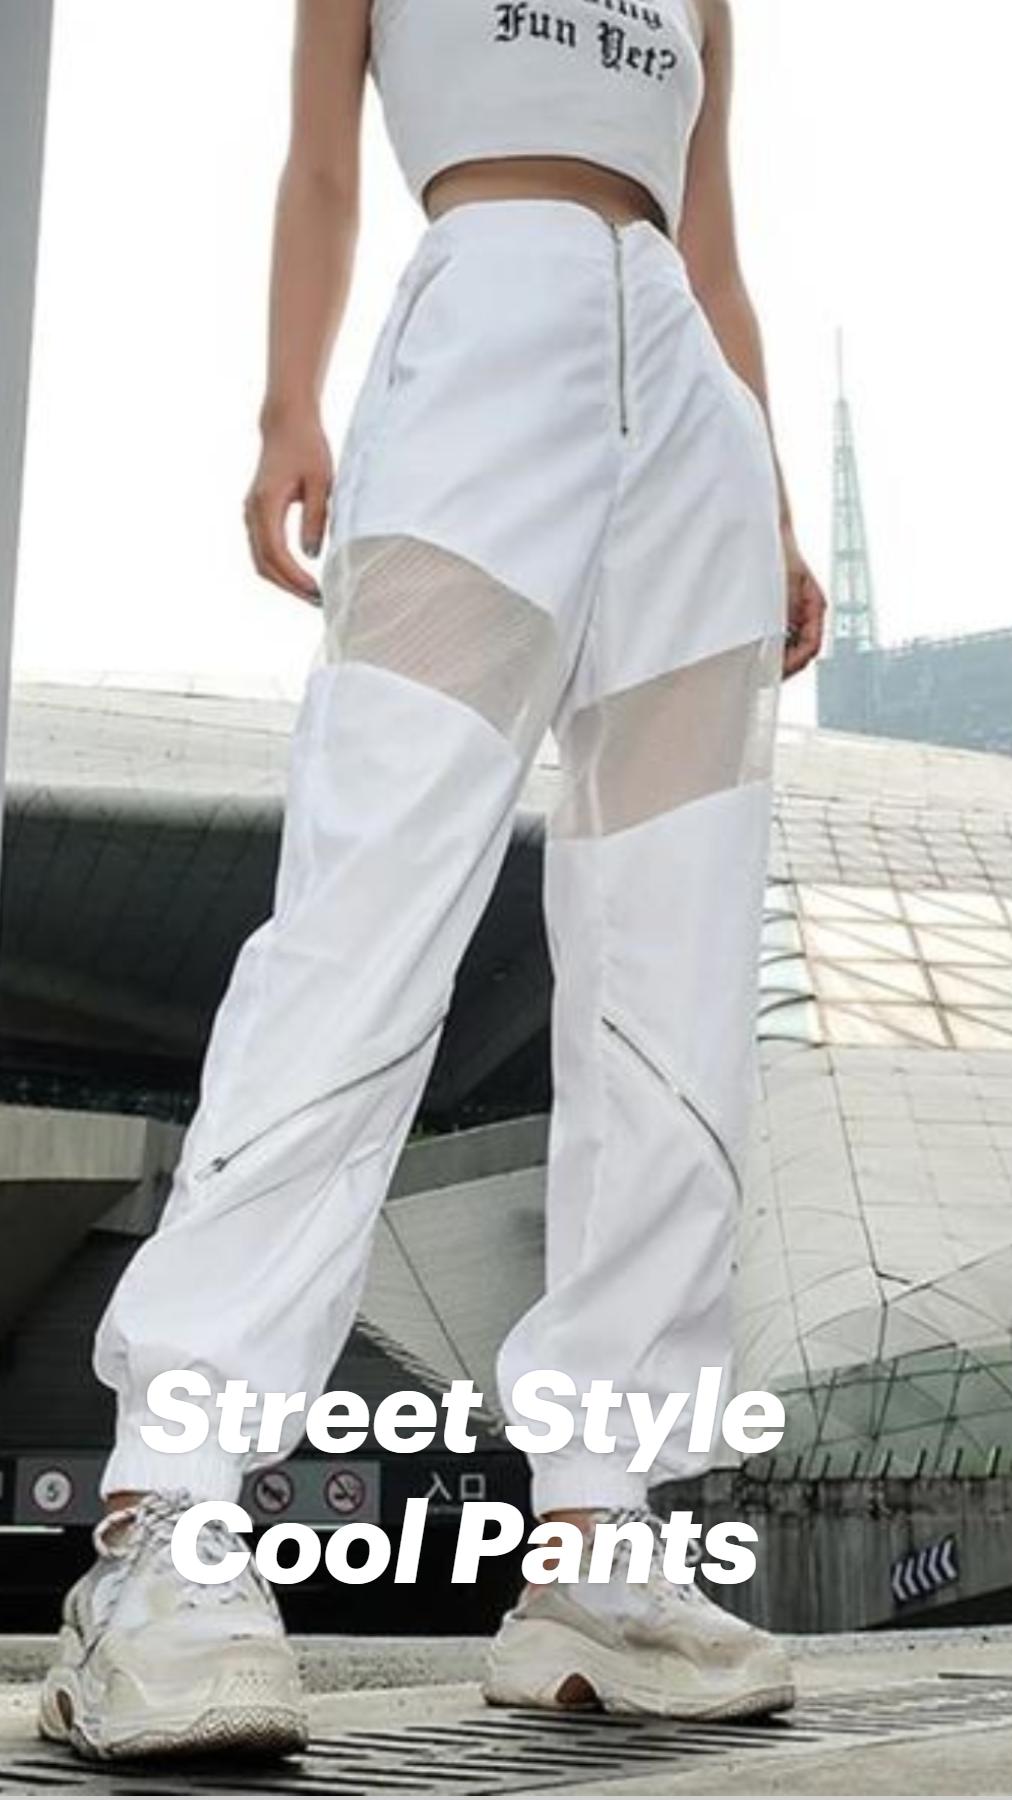 Street Style Cool Pants